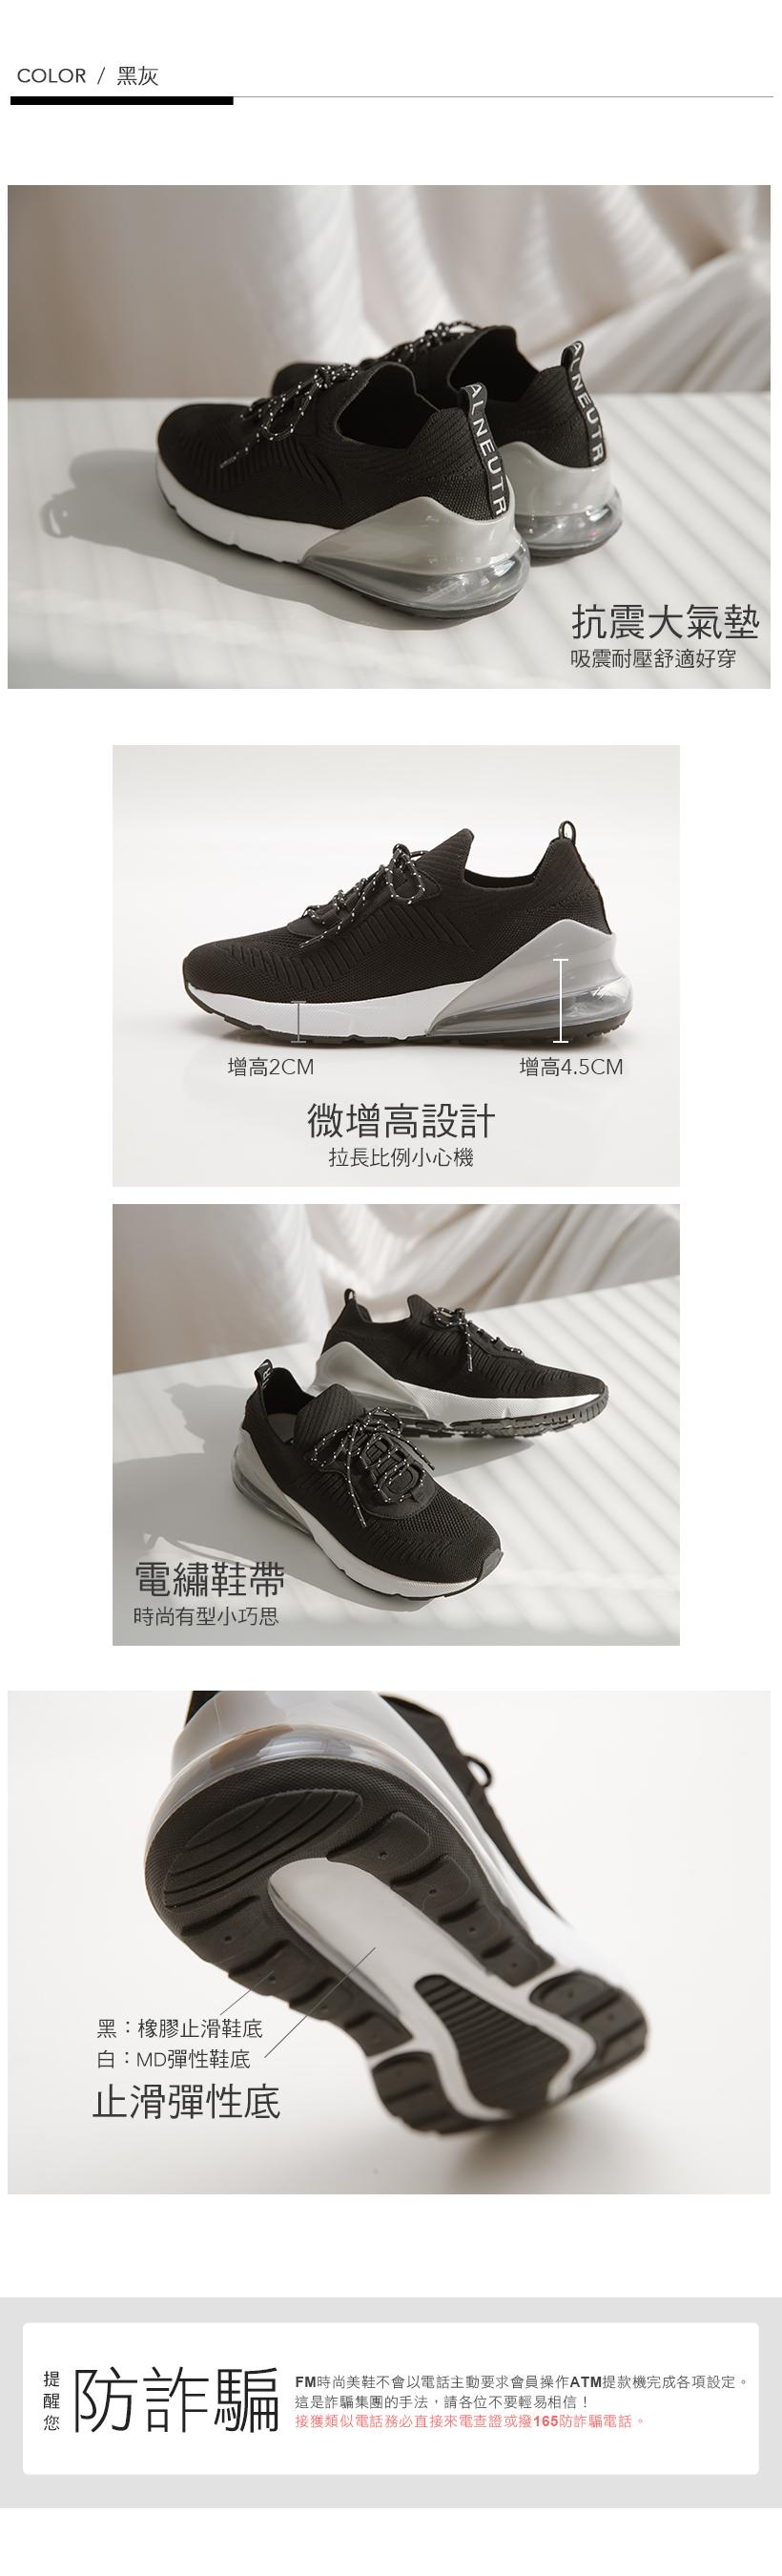 NeuTral-飛織襪套加大氣墊鞋(黑灰)-男女款